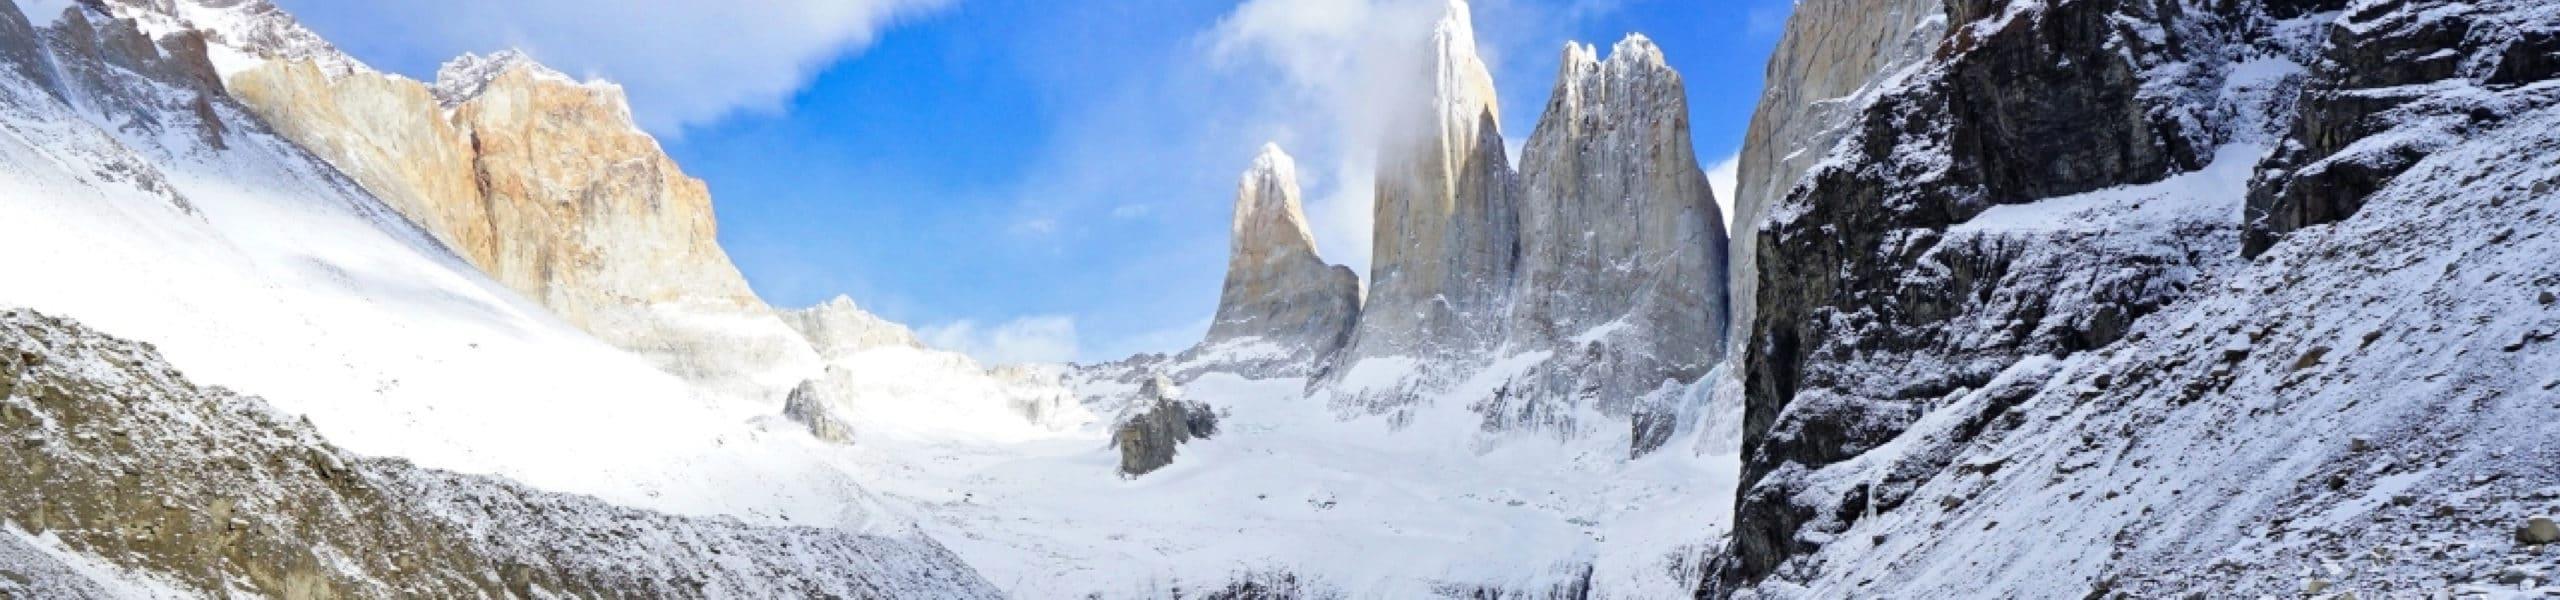 Buenos Aires, Ushuaia, Australis Cruise, Torres del Paine, El Calafate and Perito Moreno Glacier, Bariloche, Lakes Crossing, Puerto Varas, Santiago. RipioTurismo DMC for Argentina and Chile